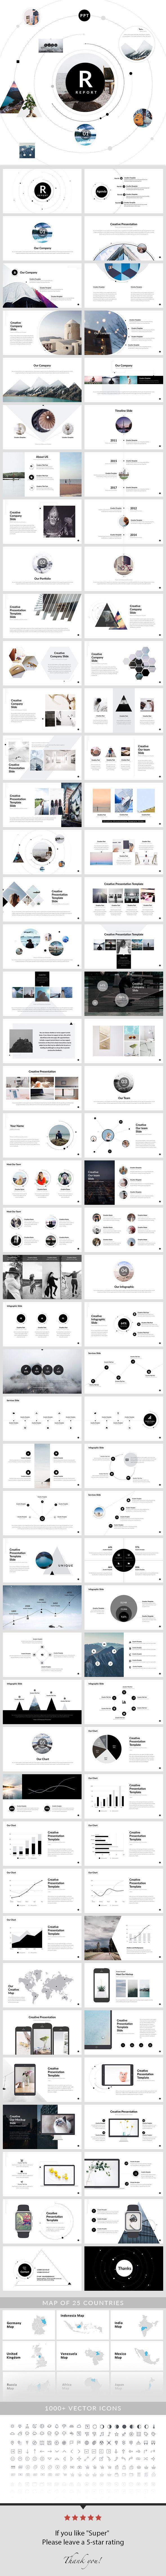 Report - PowerPoint Presentation Template on Behance